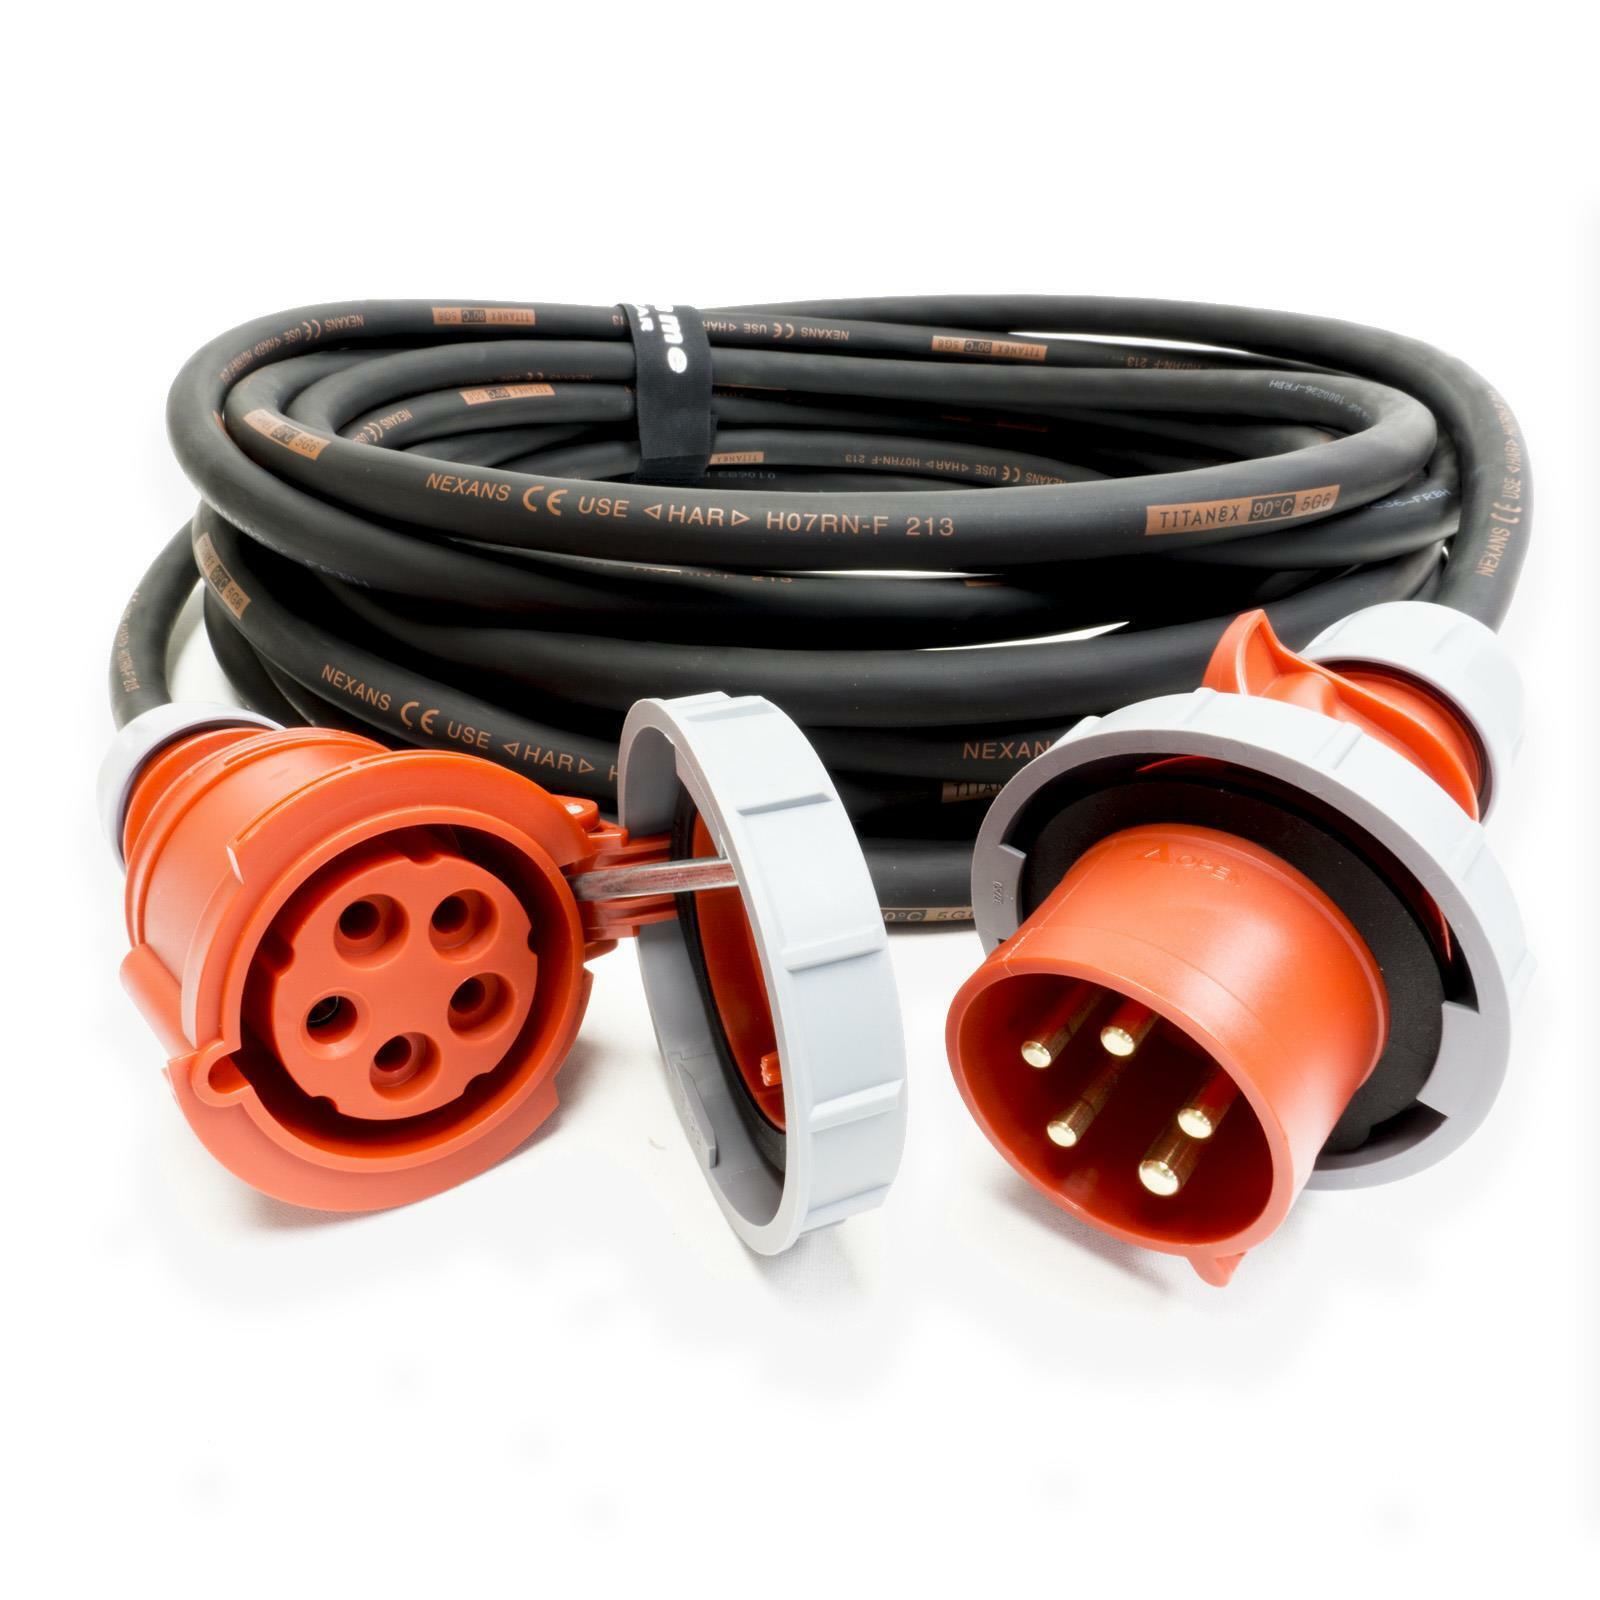 32amp Red 3 PHASE Power Cable. (5x10mm) 3P+N+E 400V. H07RN-F Rubber